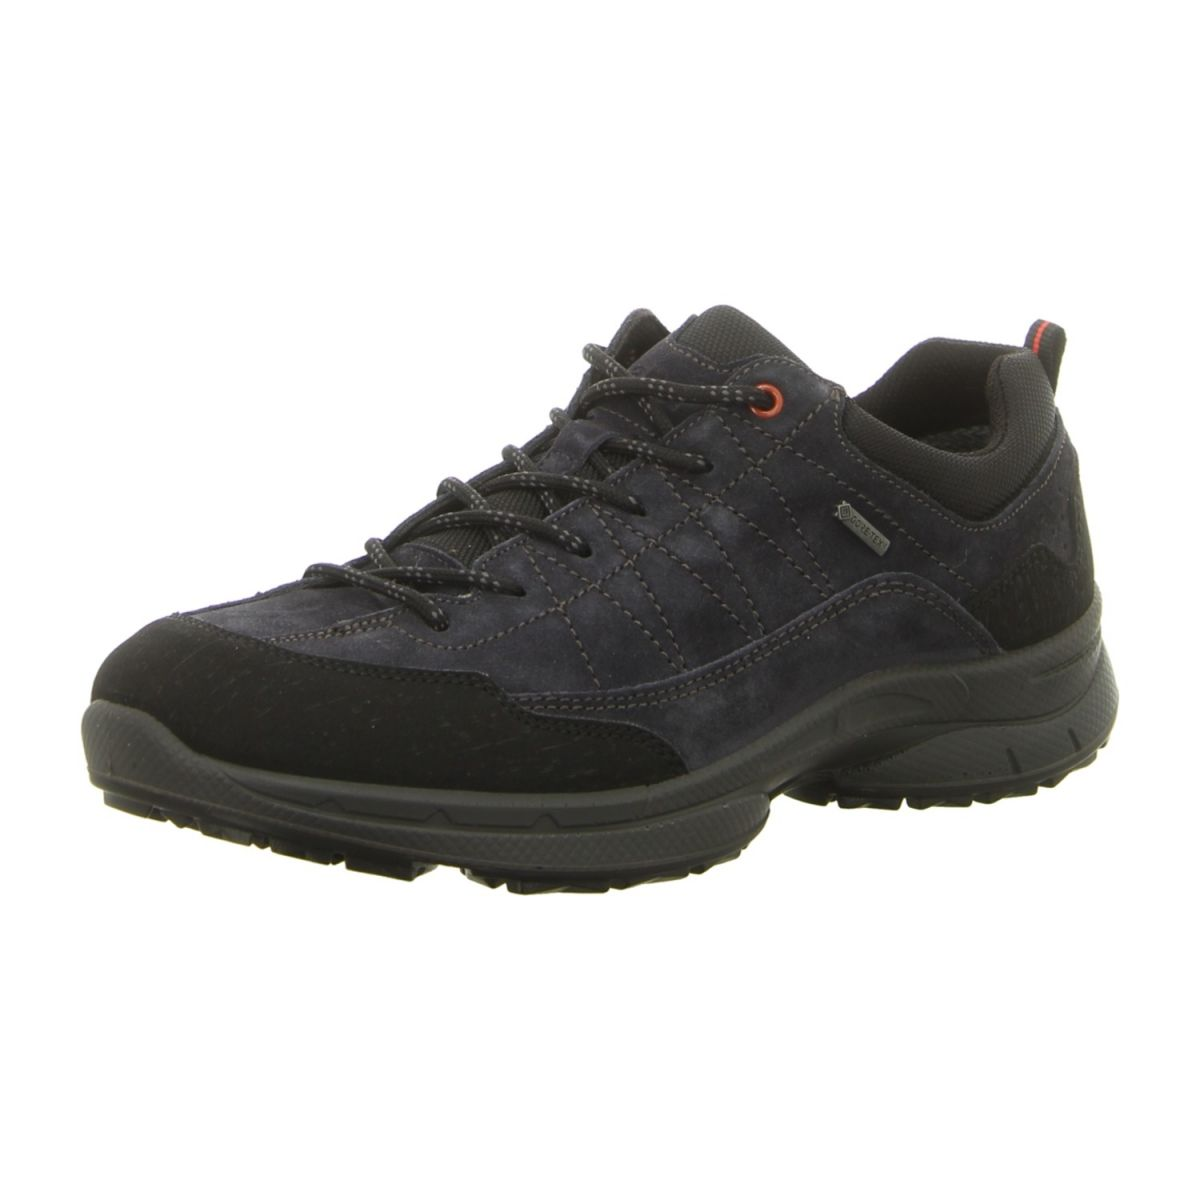 new style 68299 be41f NEU: Ara Schnürer William - 11-24206-02 - navy - | Schuhe ...